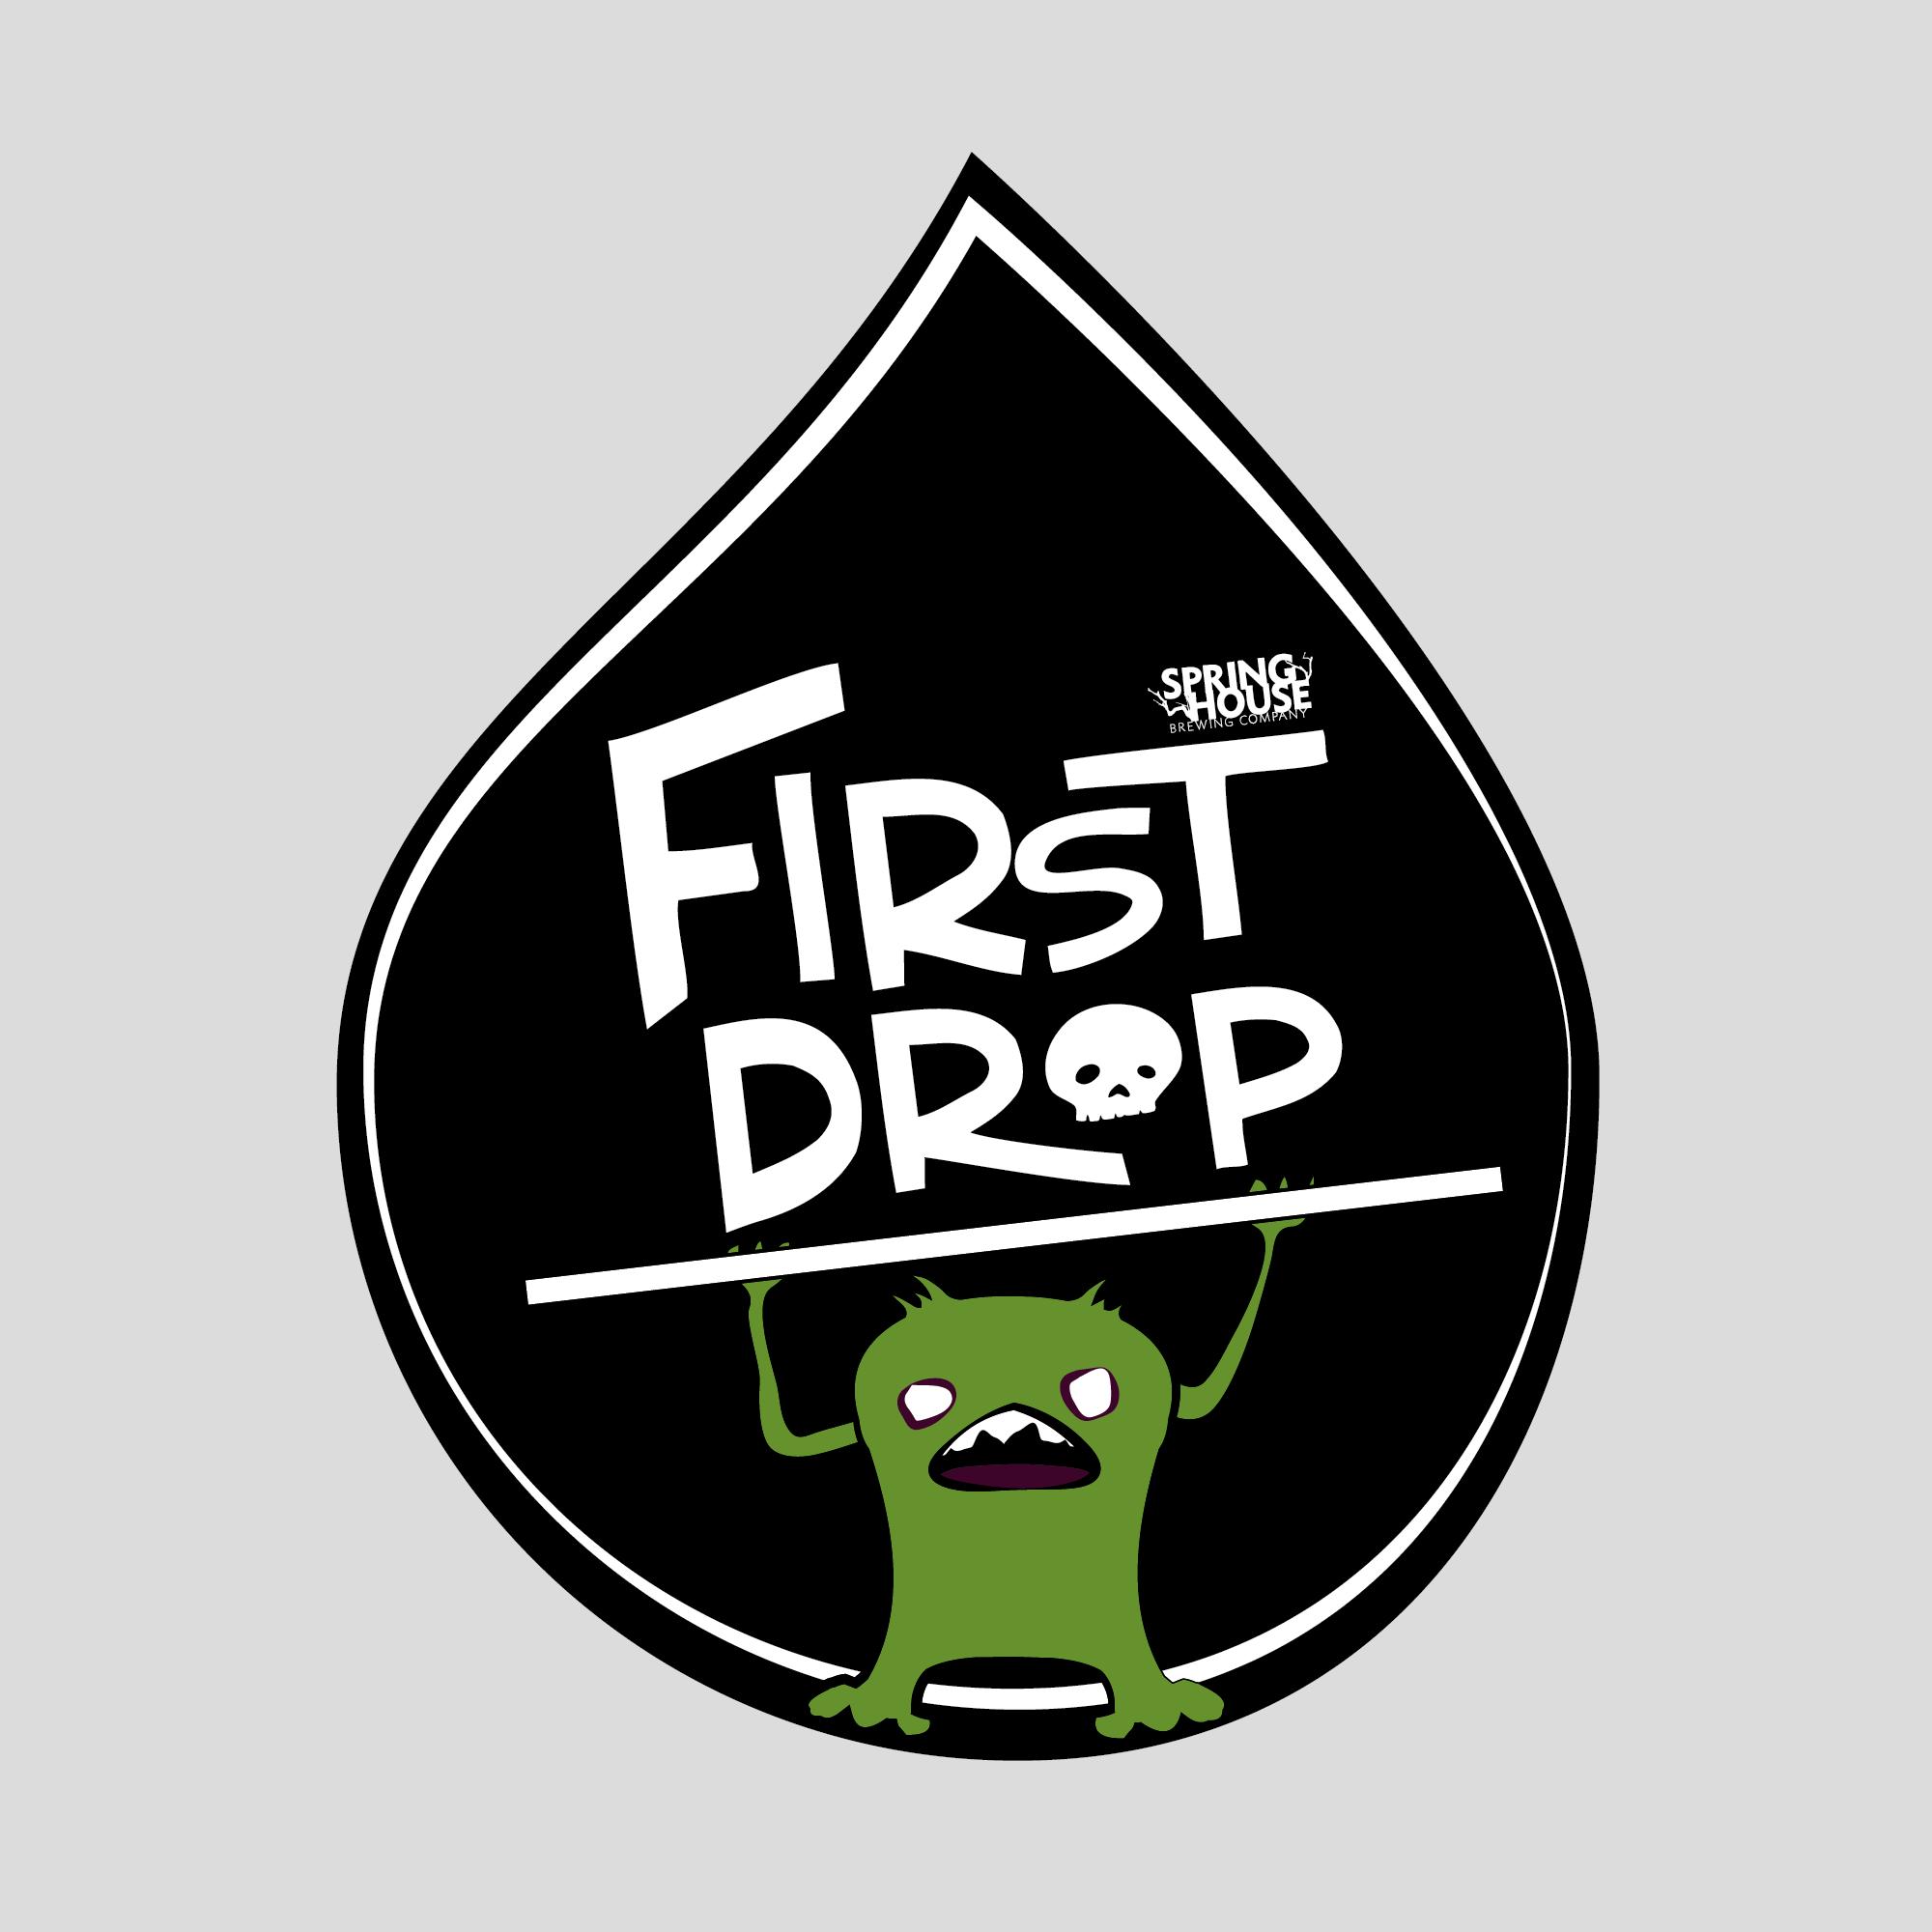 First-Drop-Untappd-nobox.png